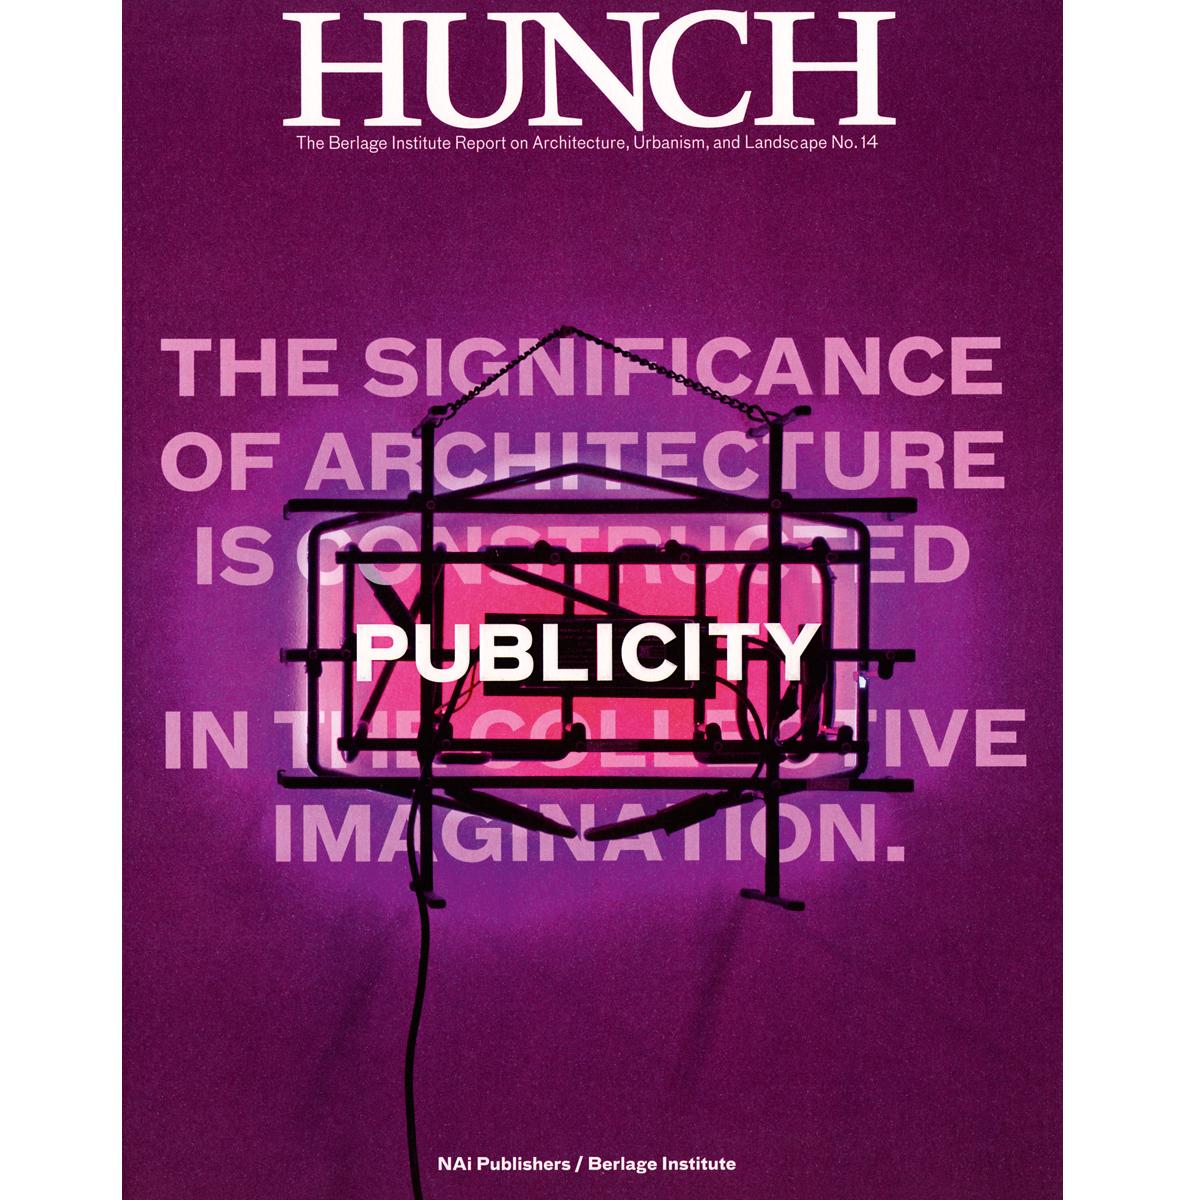 Hunch: Publicity